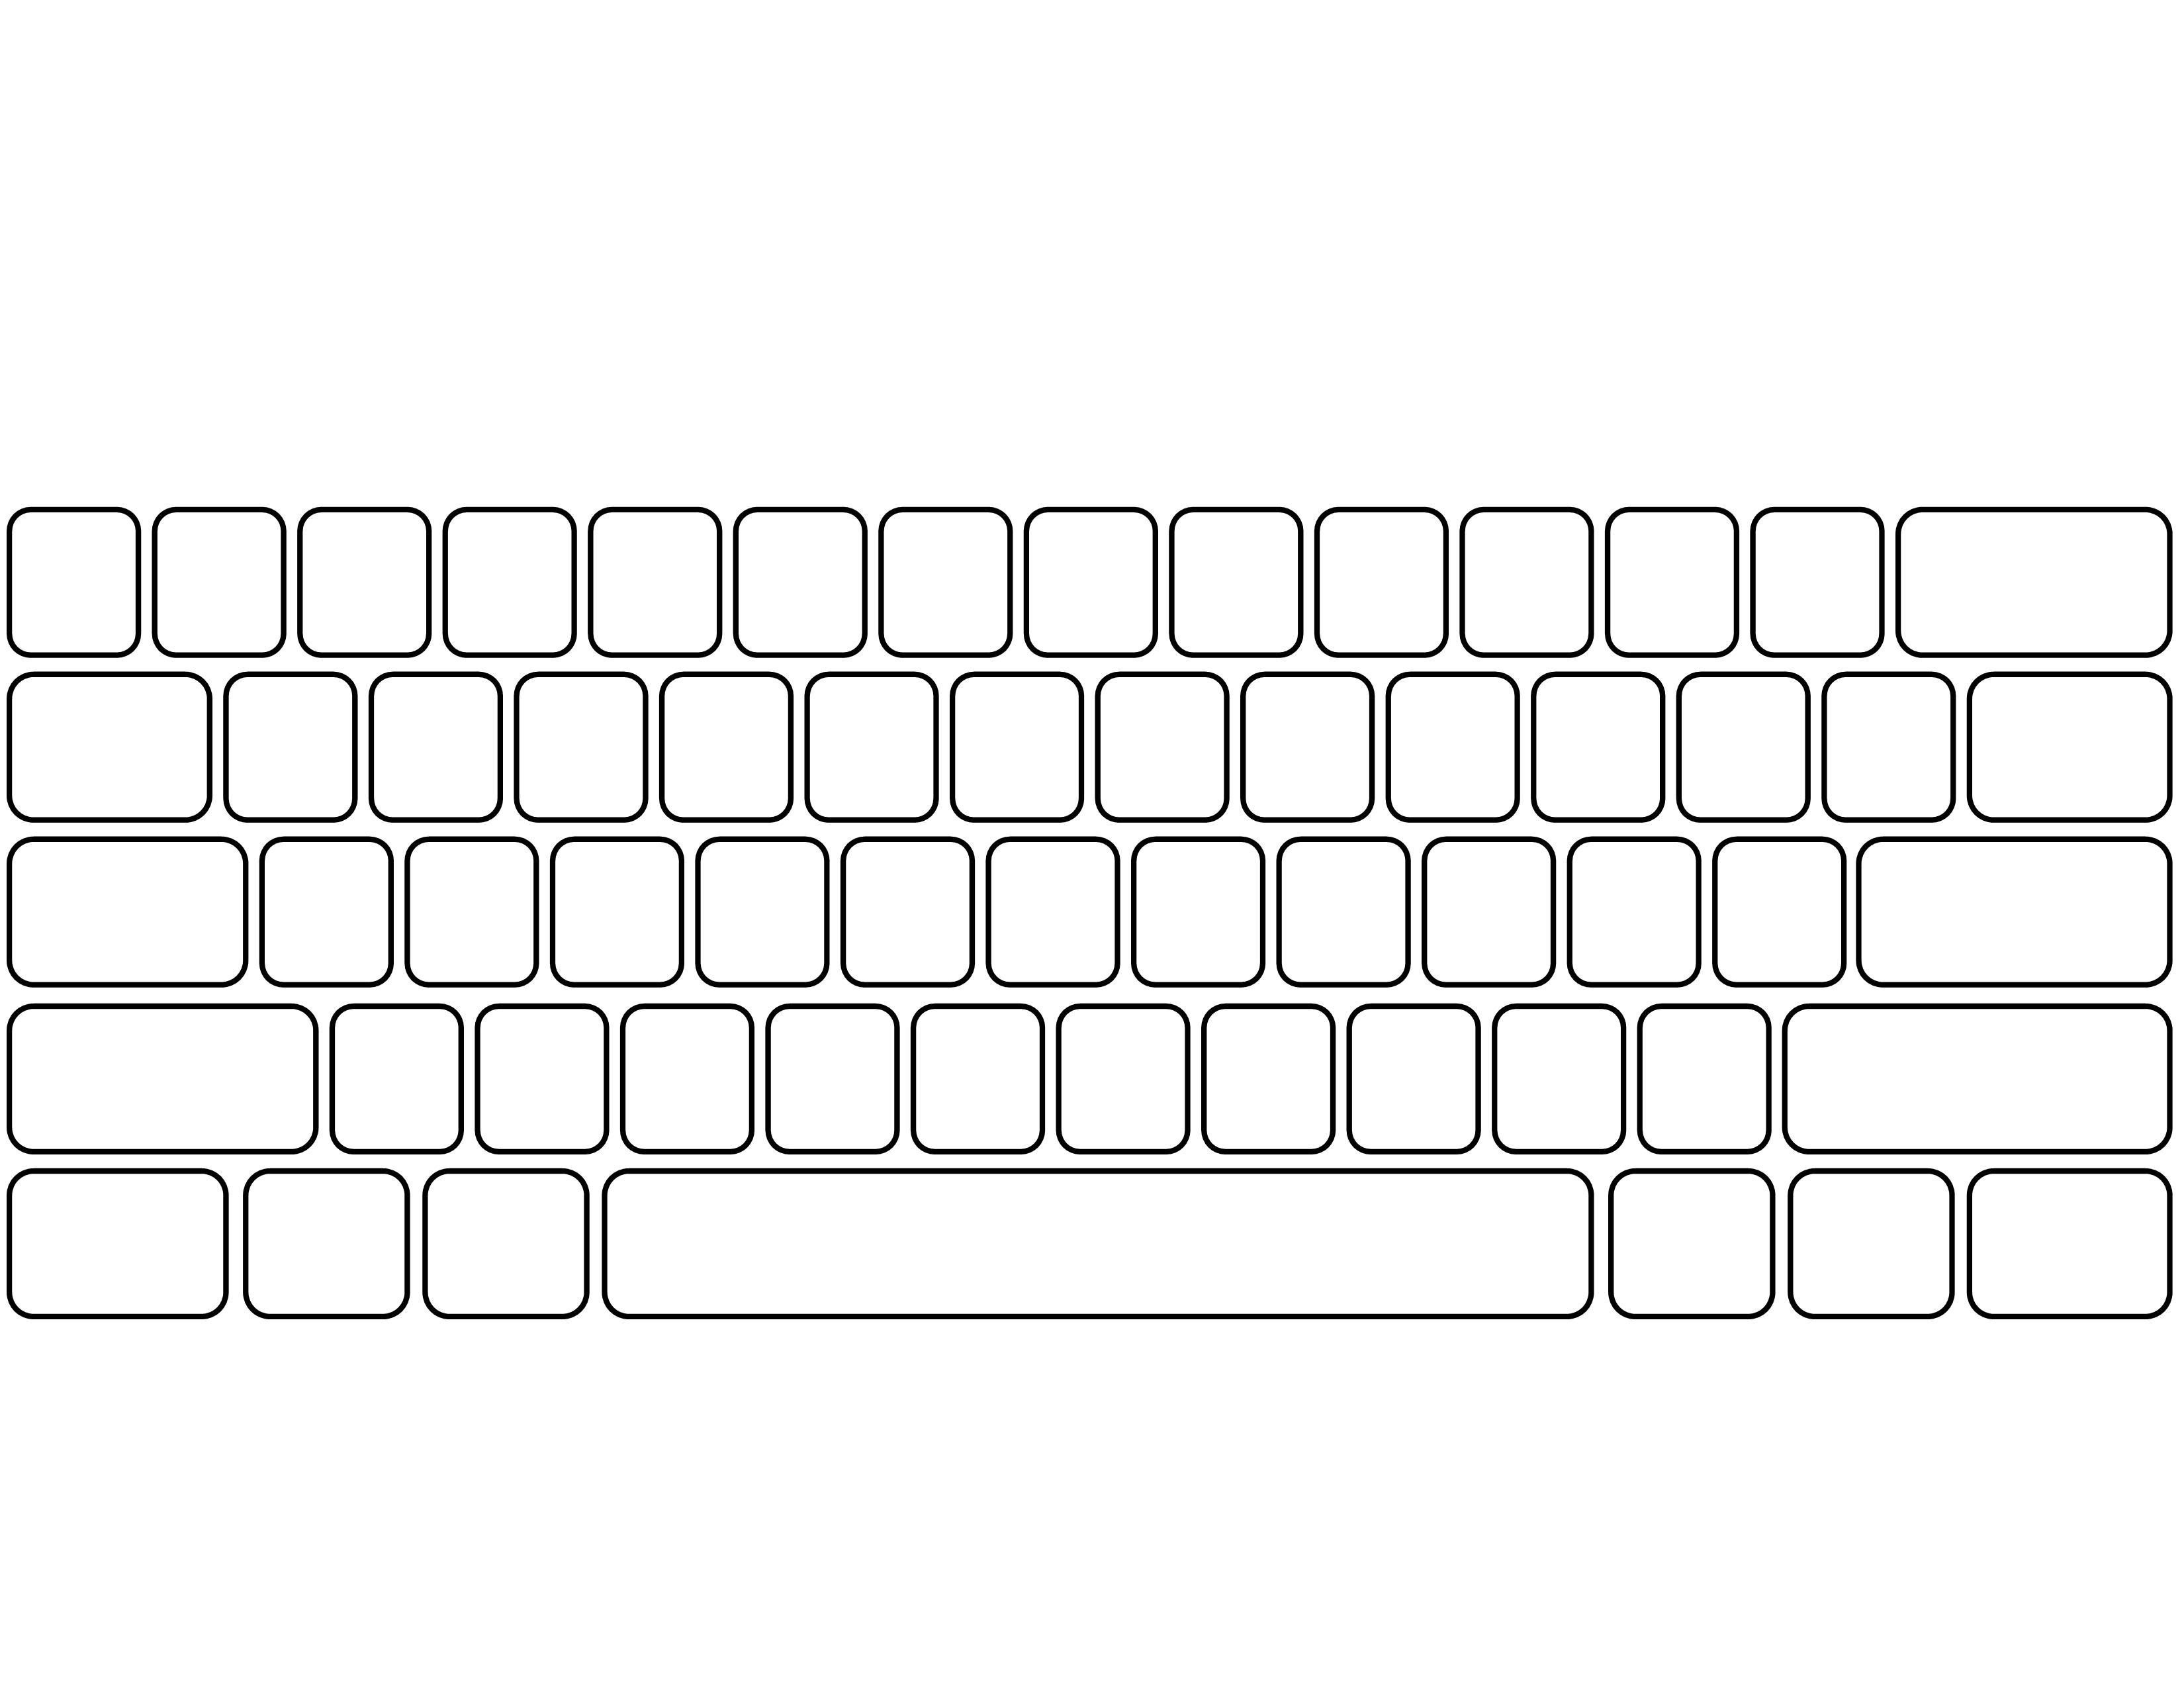 Free Printable Computer Keyboarding Worksheets